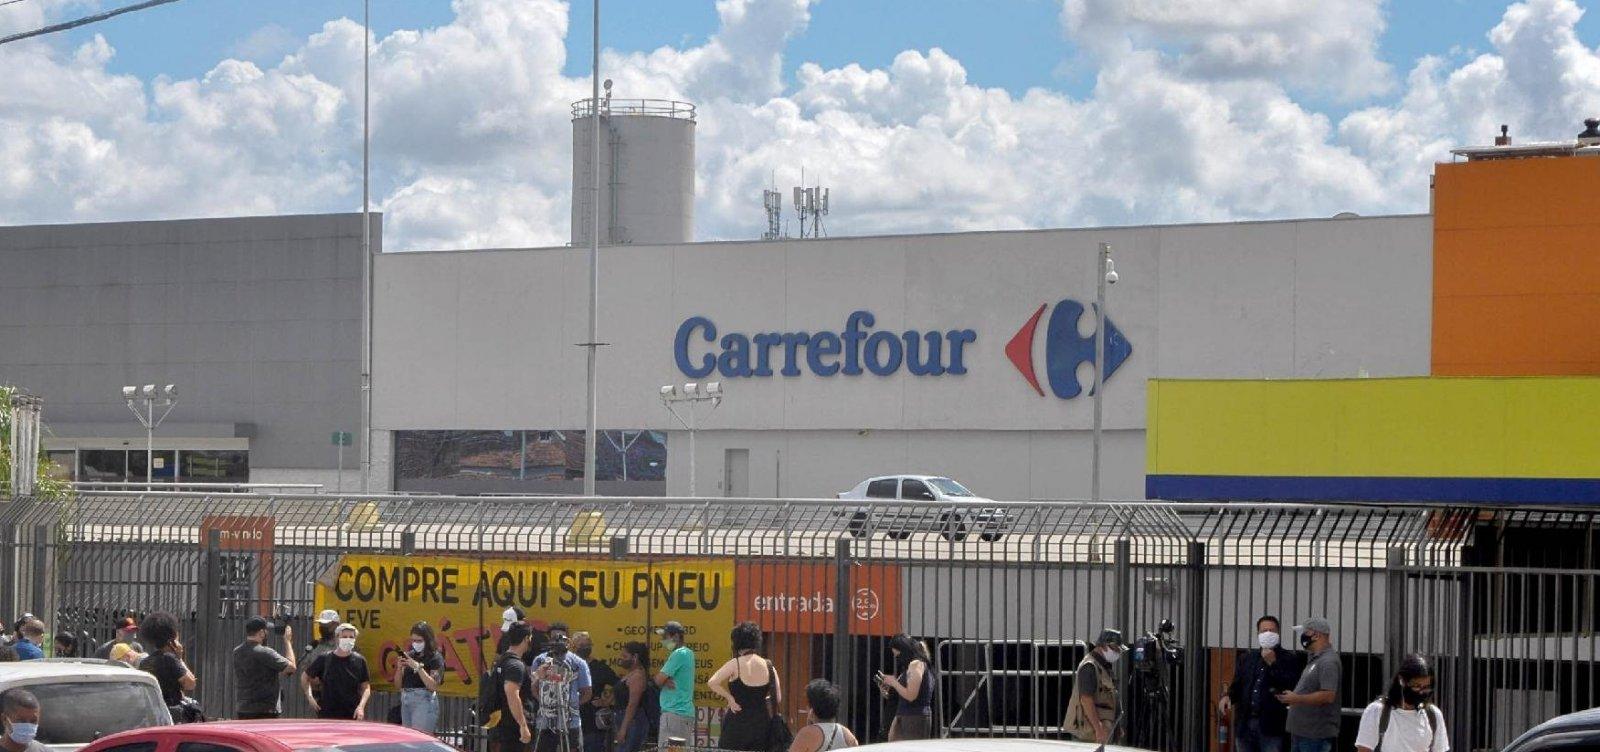 [Assassinato no Carrefour mostra 'sistema opressor e racista', lamenta Marta Rodrigues]